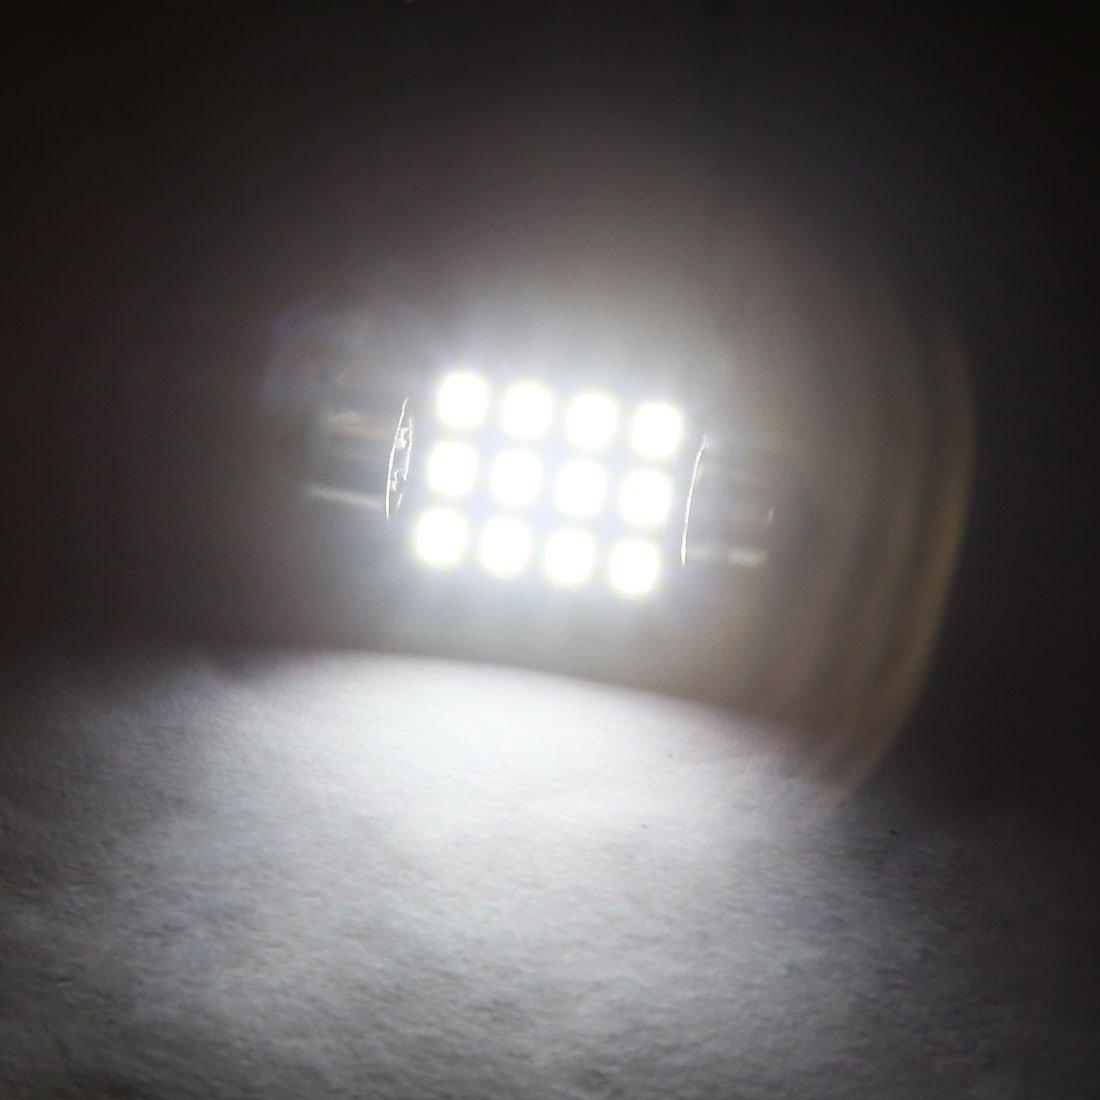 Amazon.com: DealMux 2PCS Ultra Branco 36MM 2835 12SMD Festoon Dome Mapa Interior LED Light Bulb: Automotive